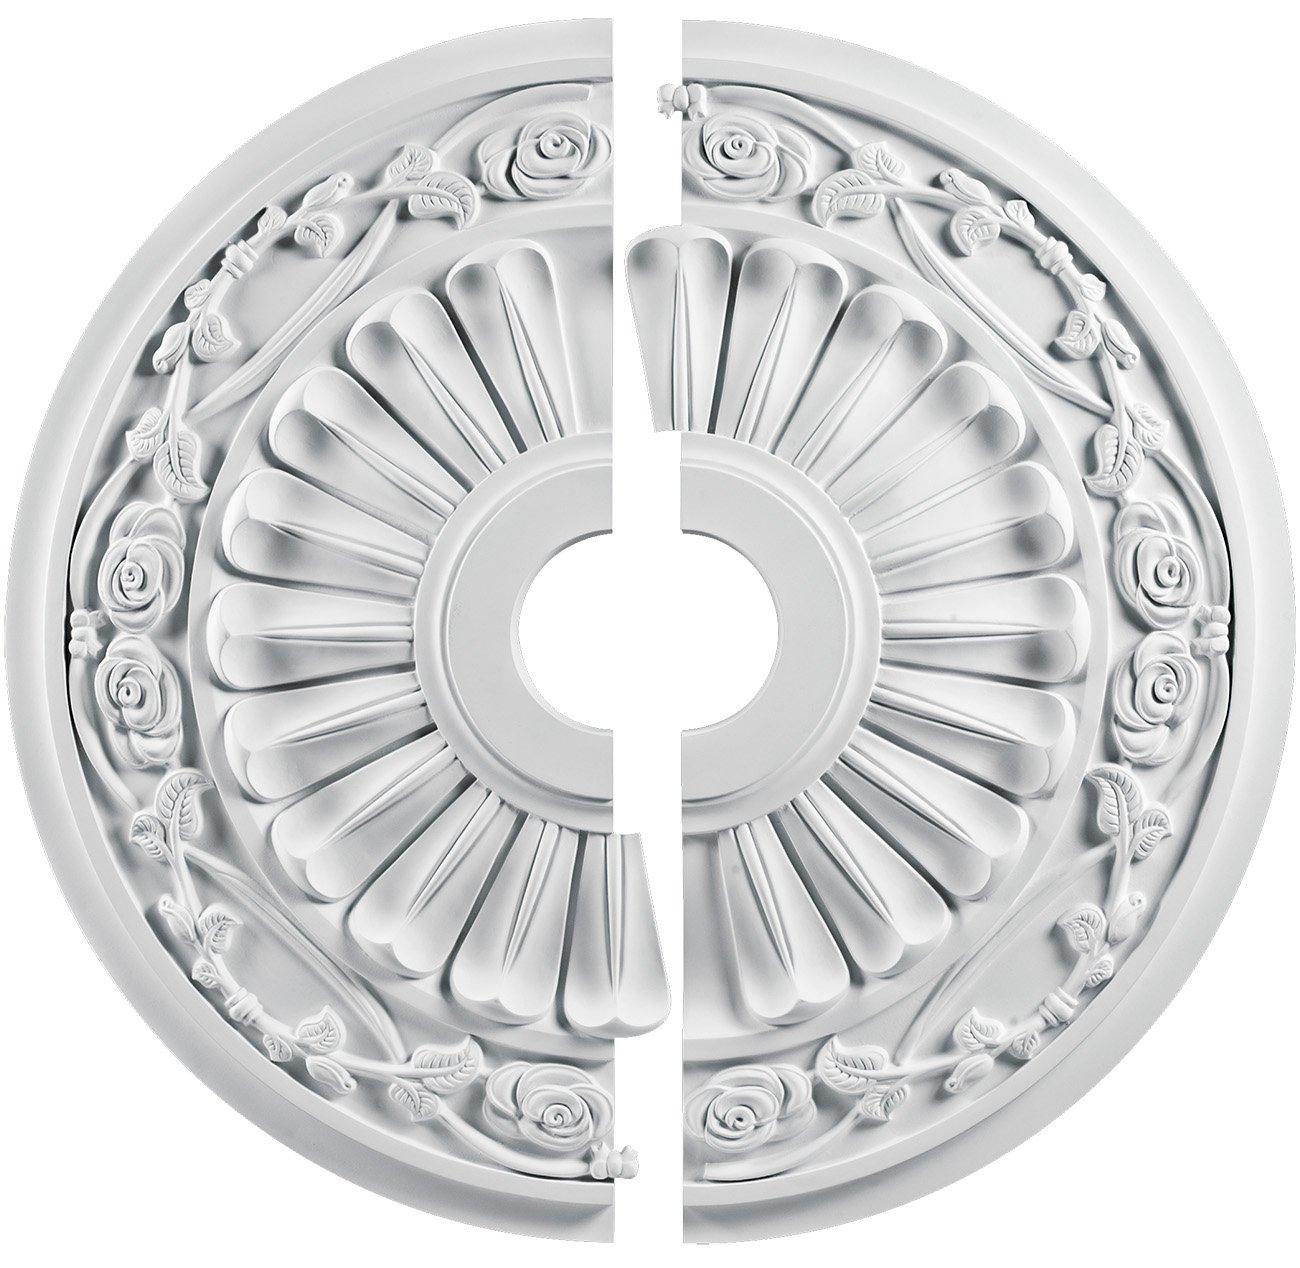 jefferson sku white in polyurethane store fypon split p moulding piece ceiling cornice so x medallion